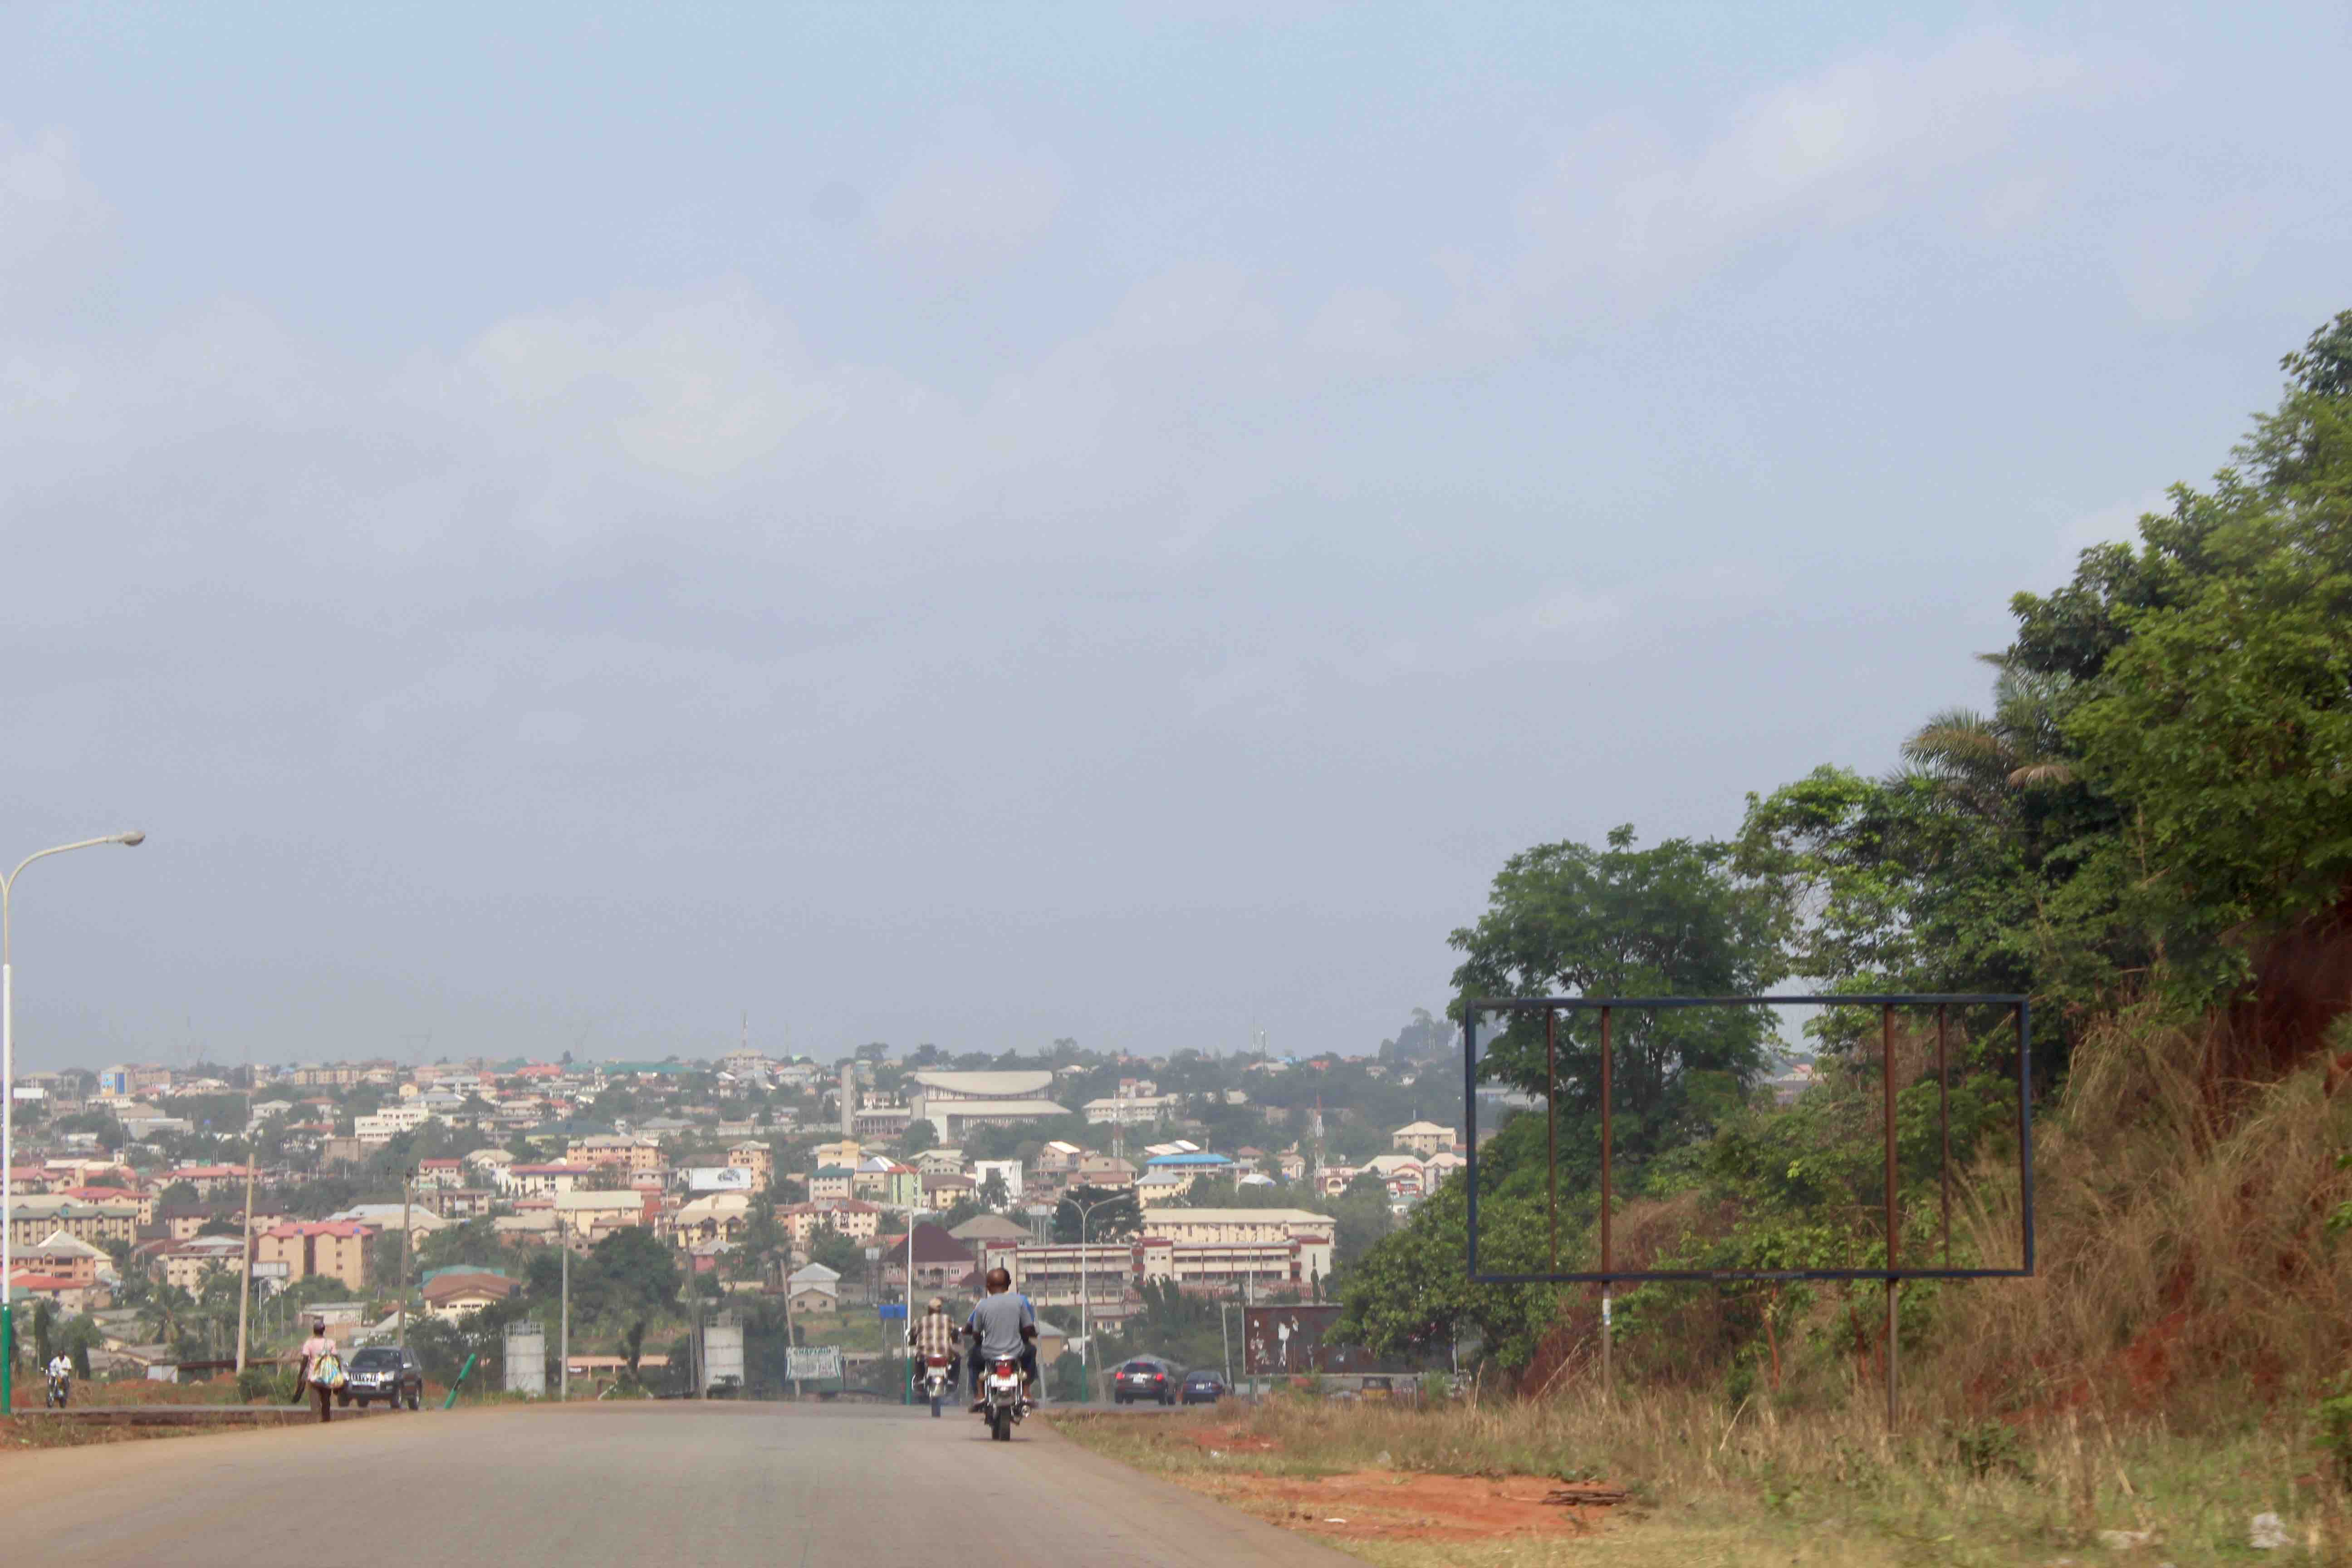 Awka, Anambra State, Nigeria. #JujuFilms